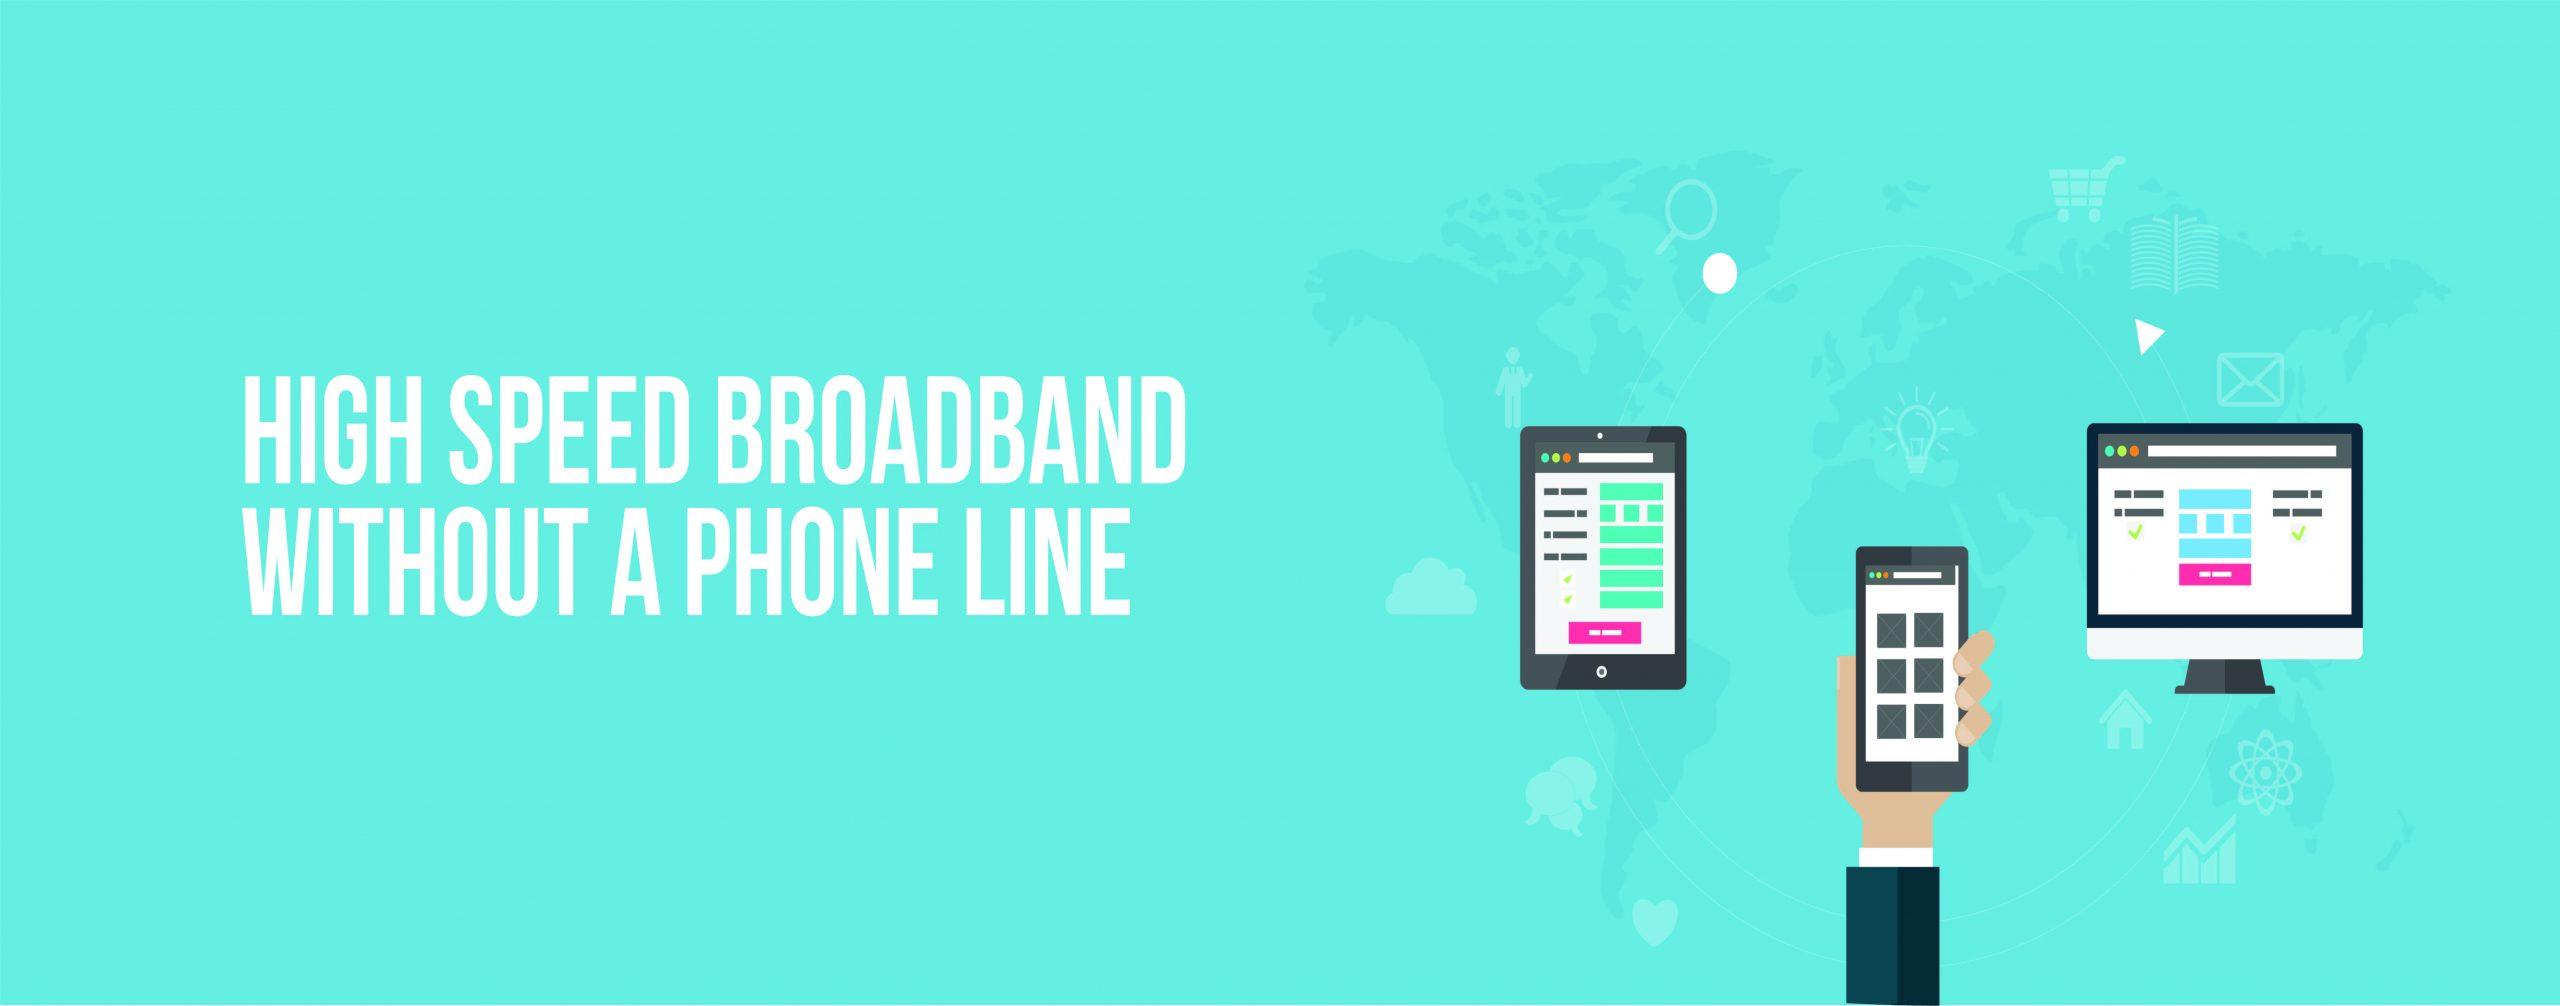 Broadband banner